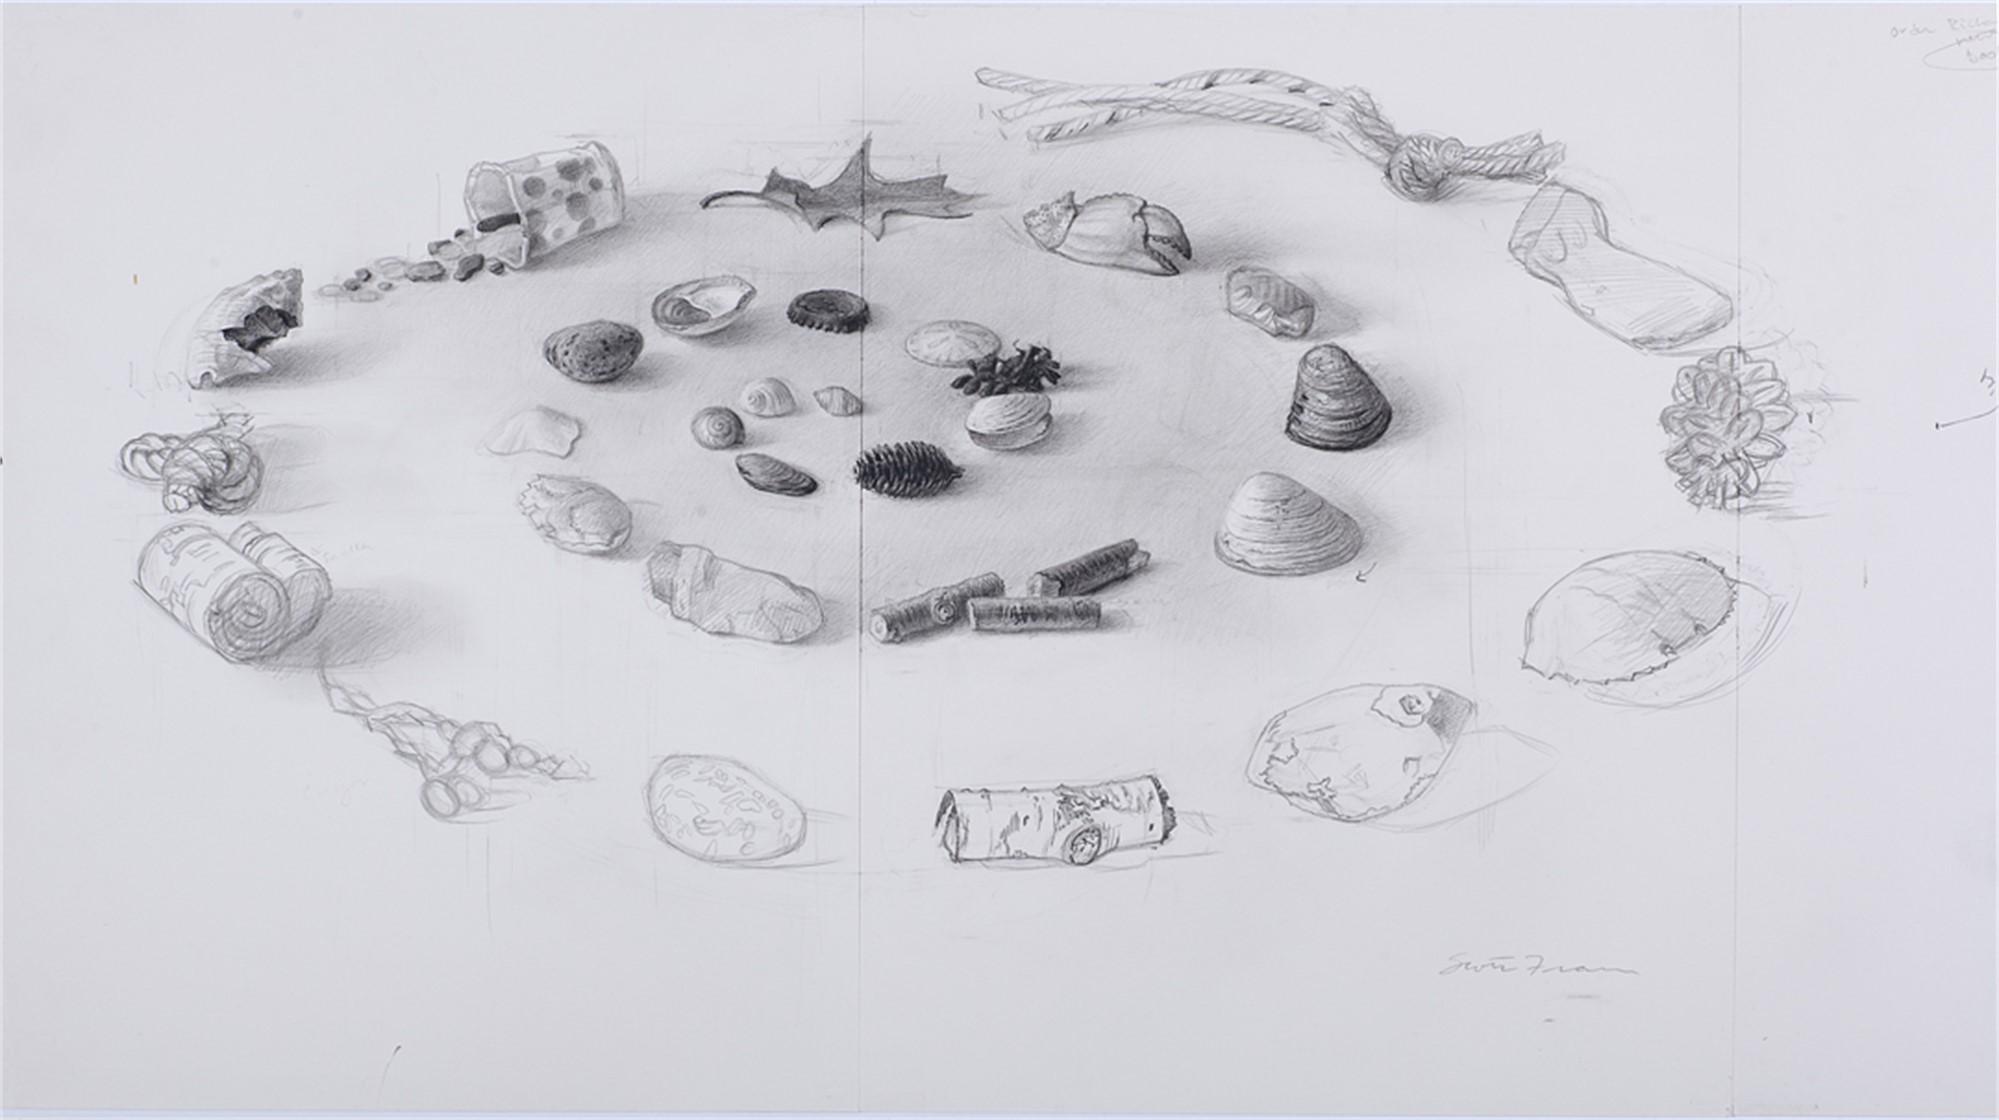 Mt. Desert Drawing Pre-study by Scott Fraser